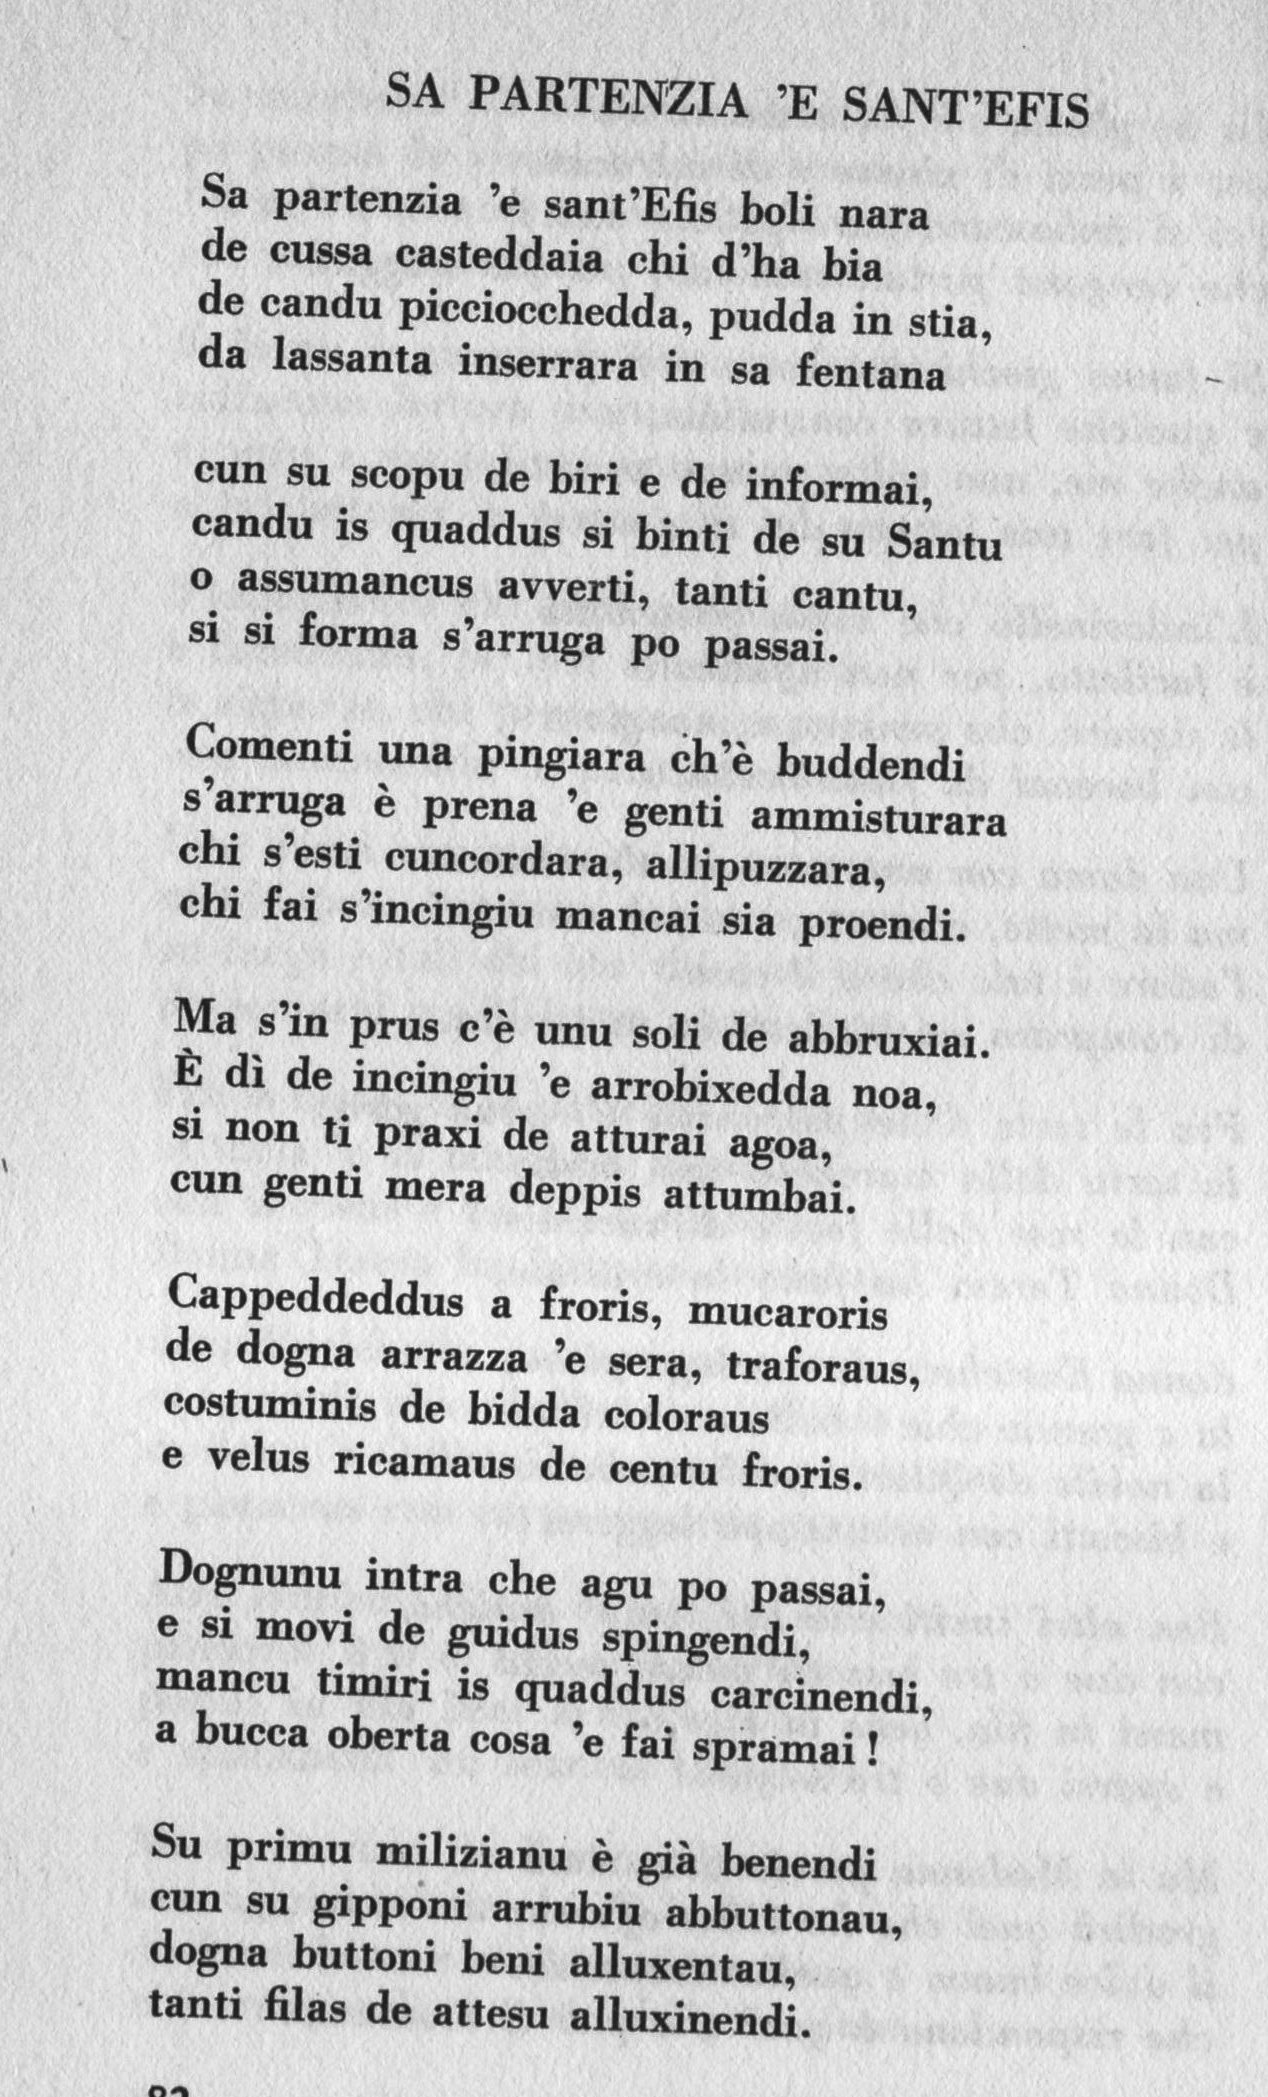 Poesie Di Natale In Sardo.Sant Efisio In Versi 1 Parte Musicamore